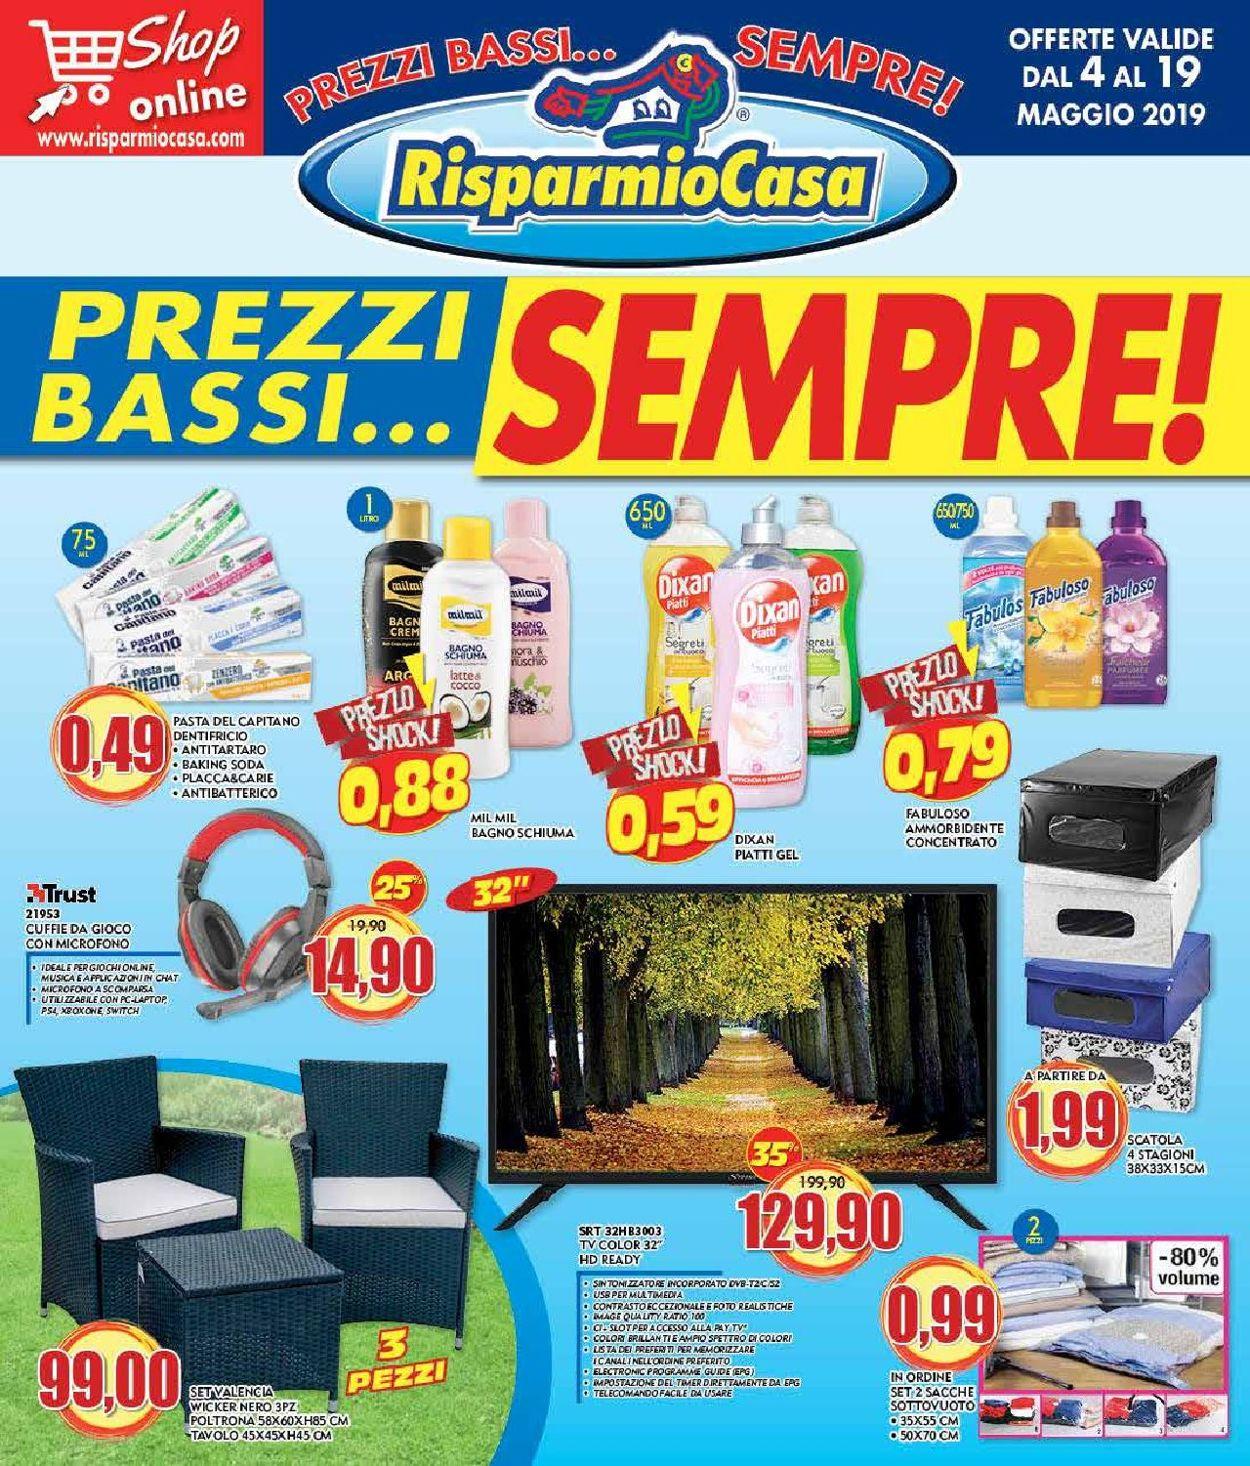 Volantino Risparmio Casa - Offerte 04/05-19/05/2019